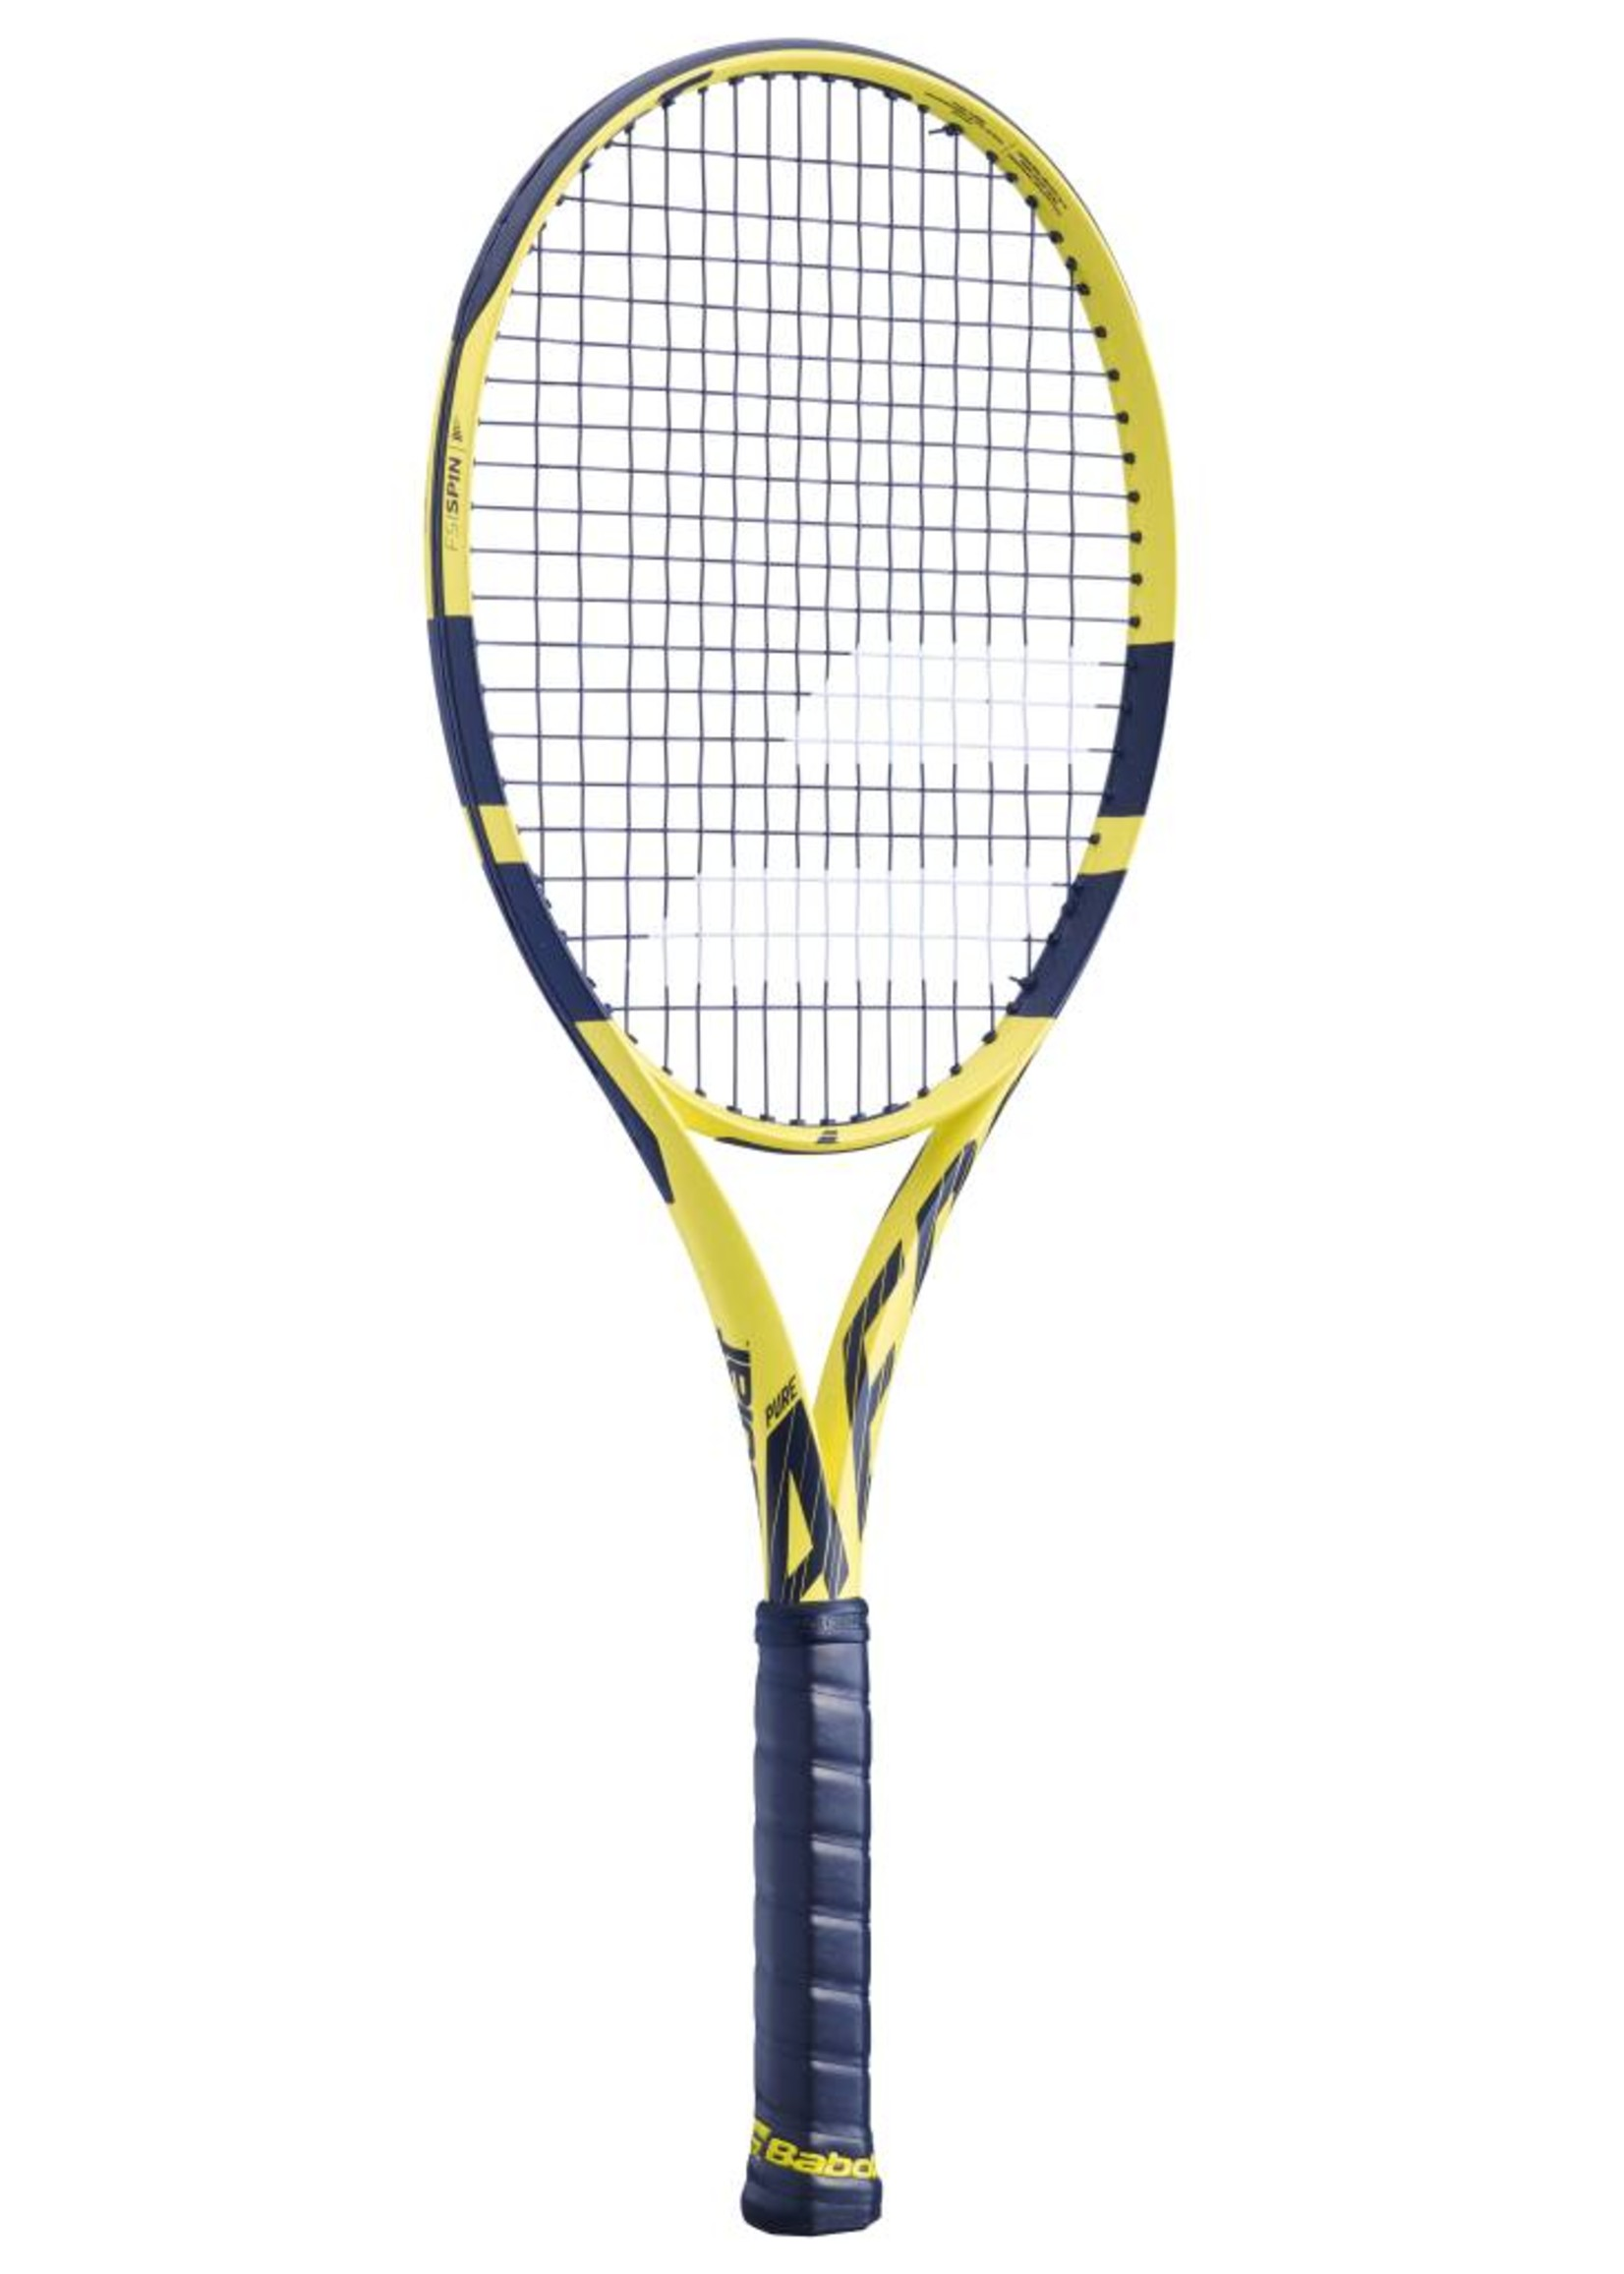 Babolat Babolat Pure Aero Team Tennis Racket (2019)